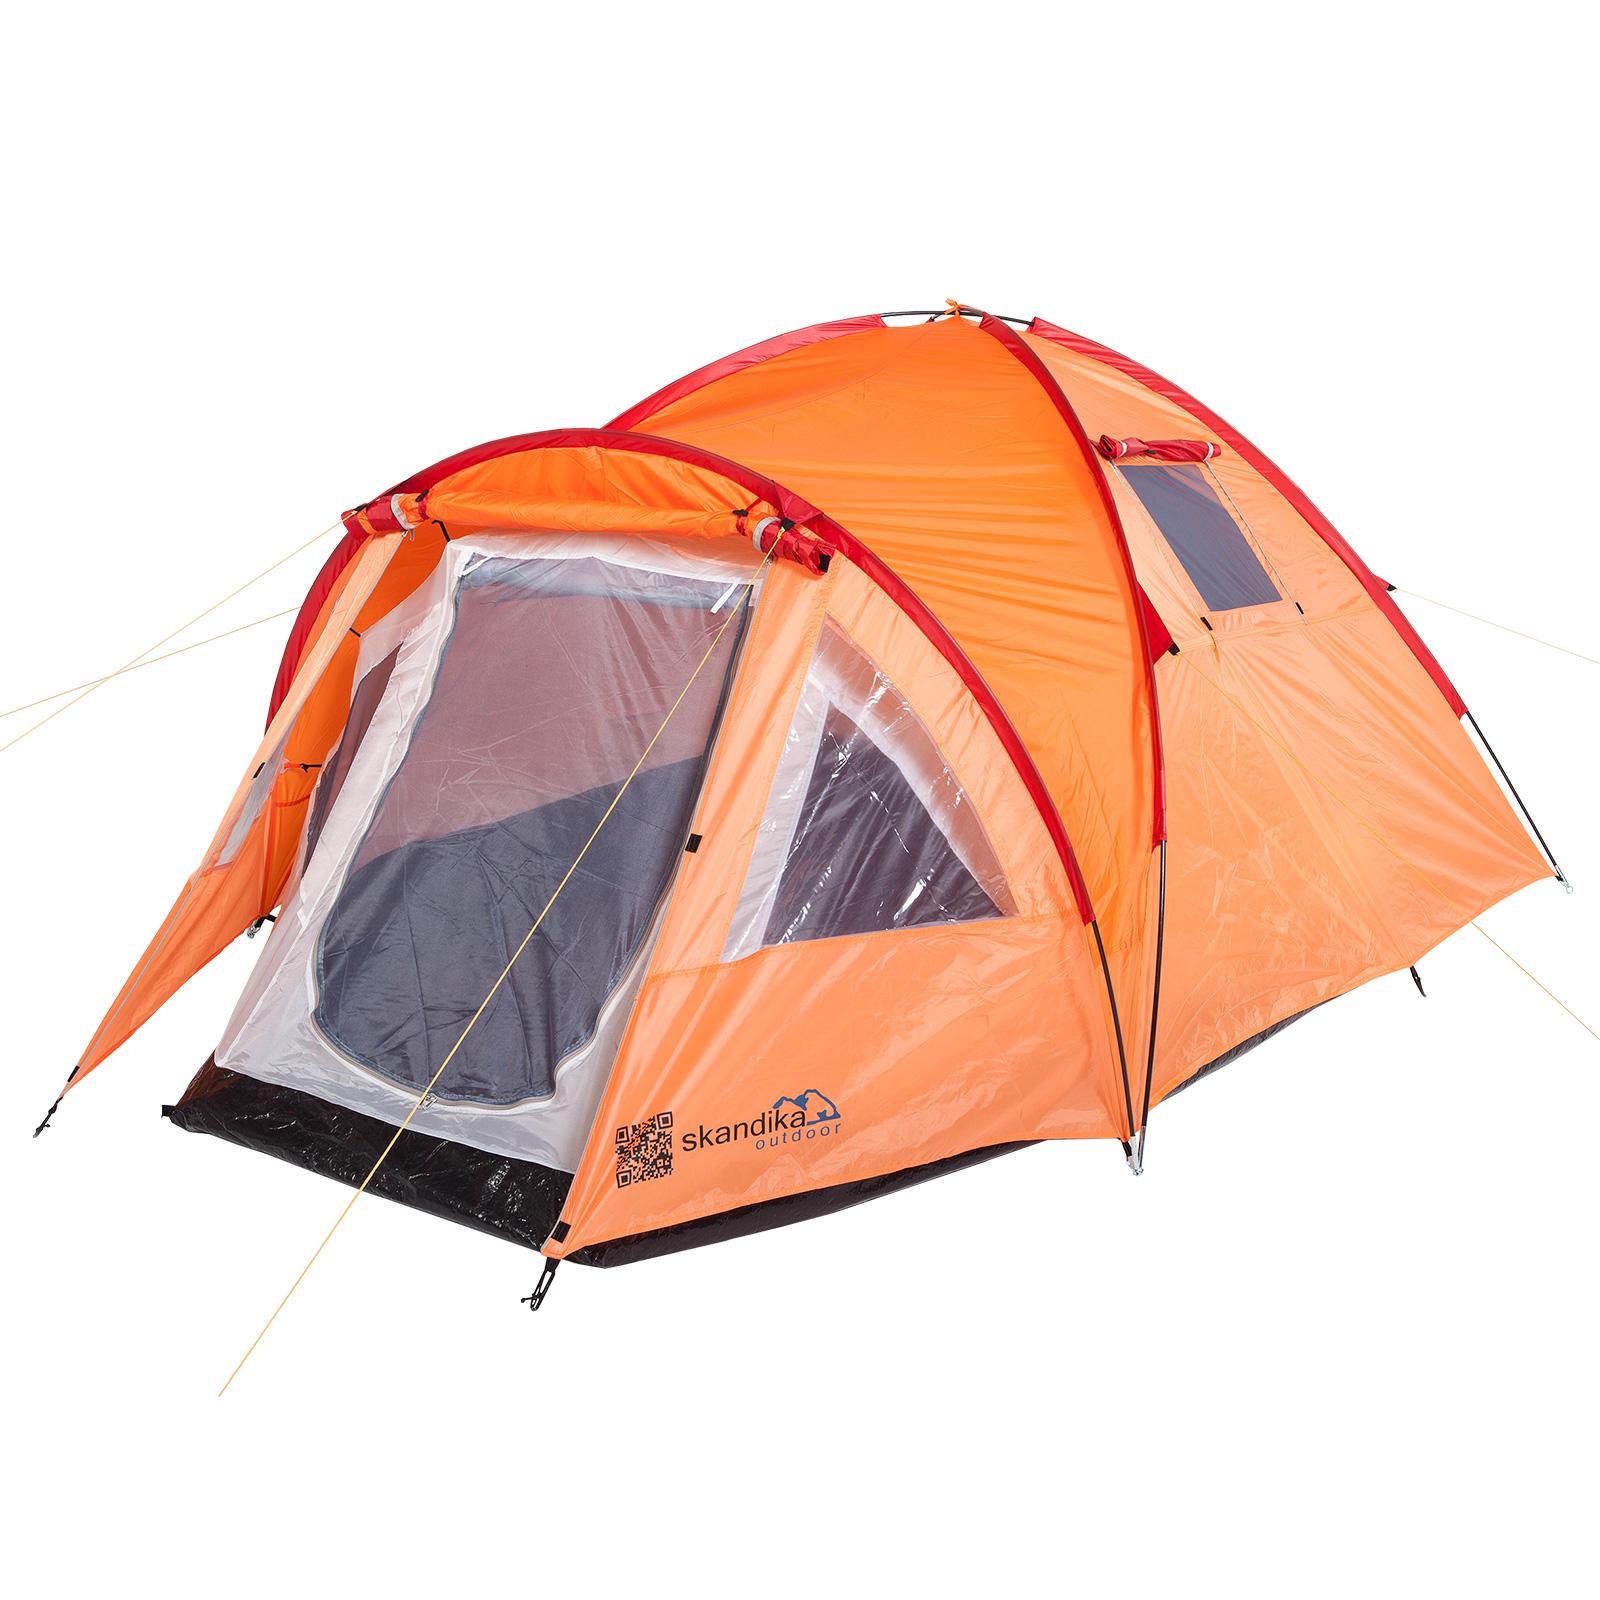 skandika trekkingzelt 2 3 4 personen campingzelt 11 modelle zur auswahl neu ebay. Black Bedroom Furniture Sets. Home Design Ideas